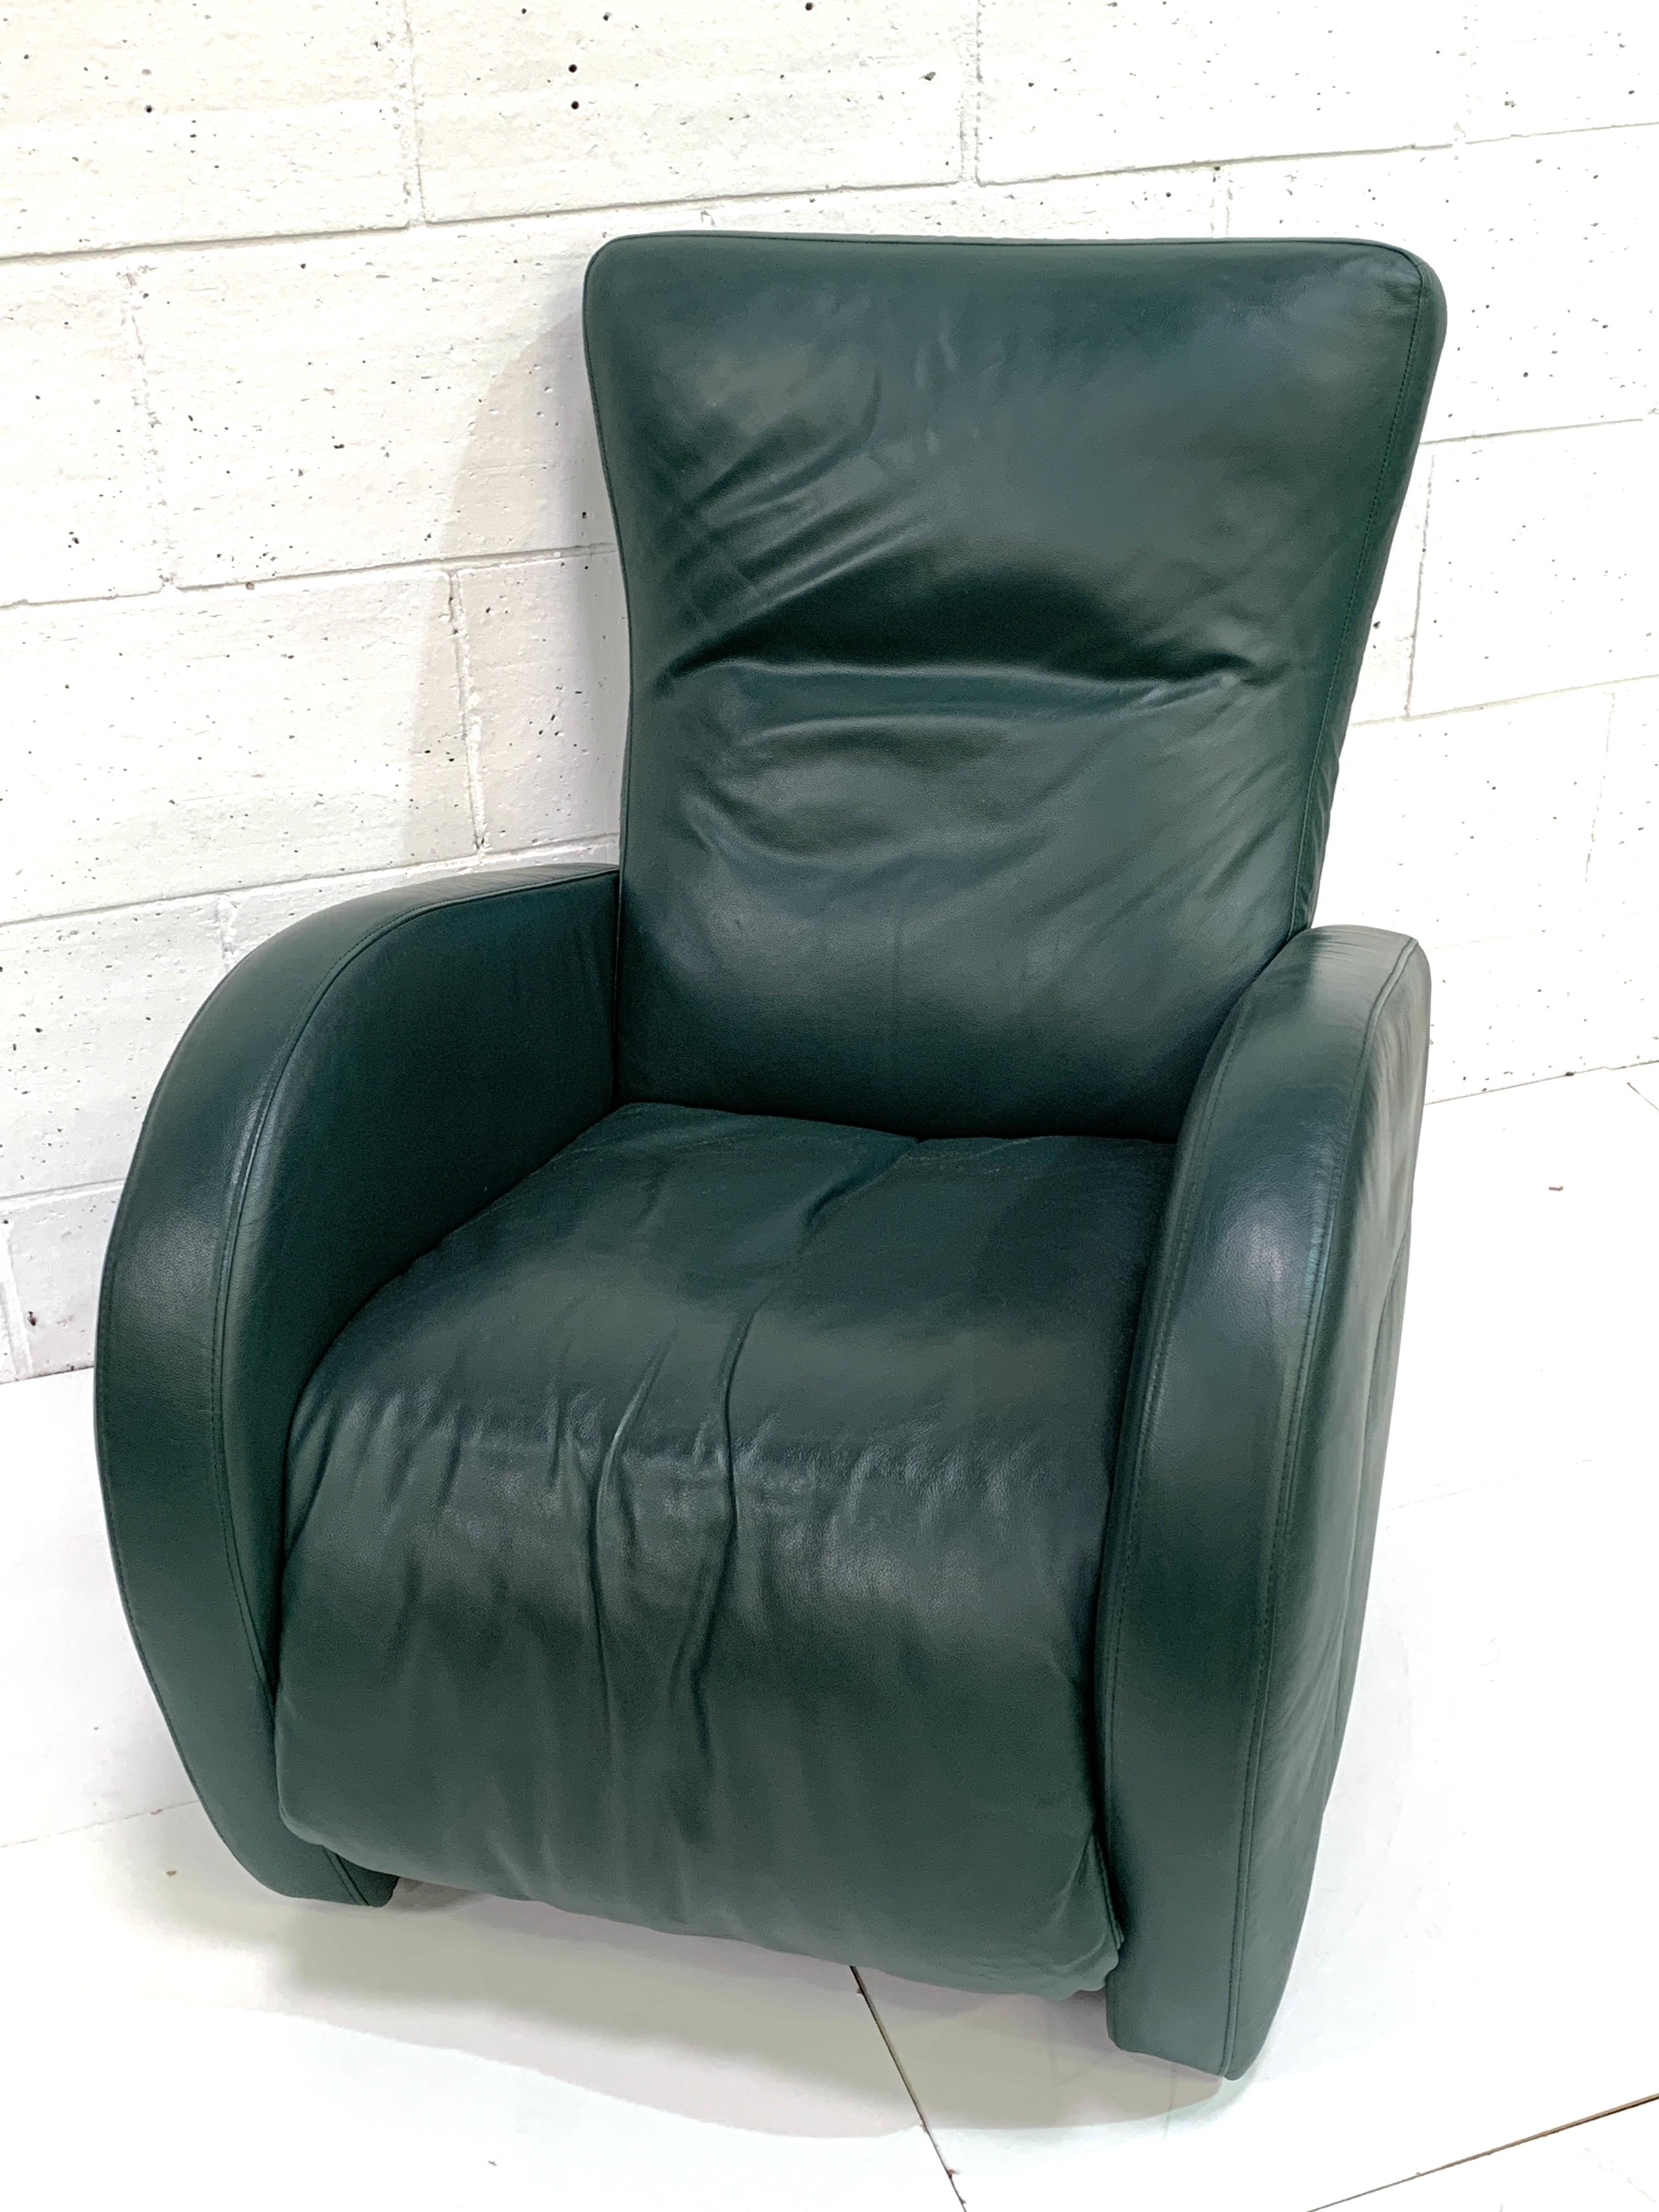 Steinhoff TV reclinable armchair - Image 3 of 4